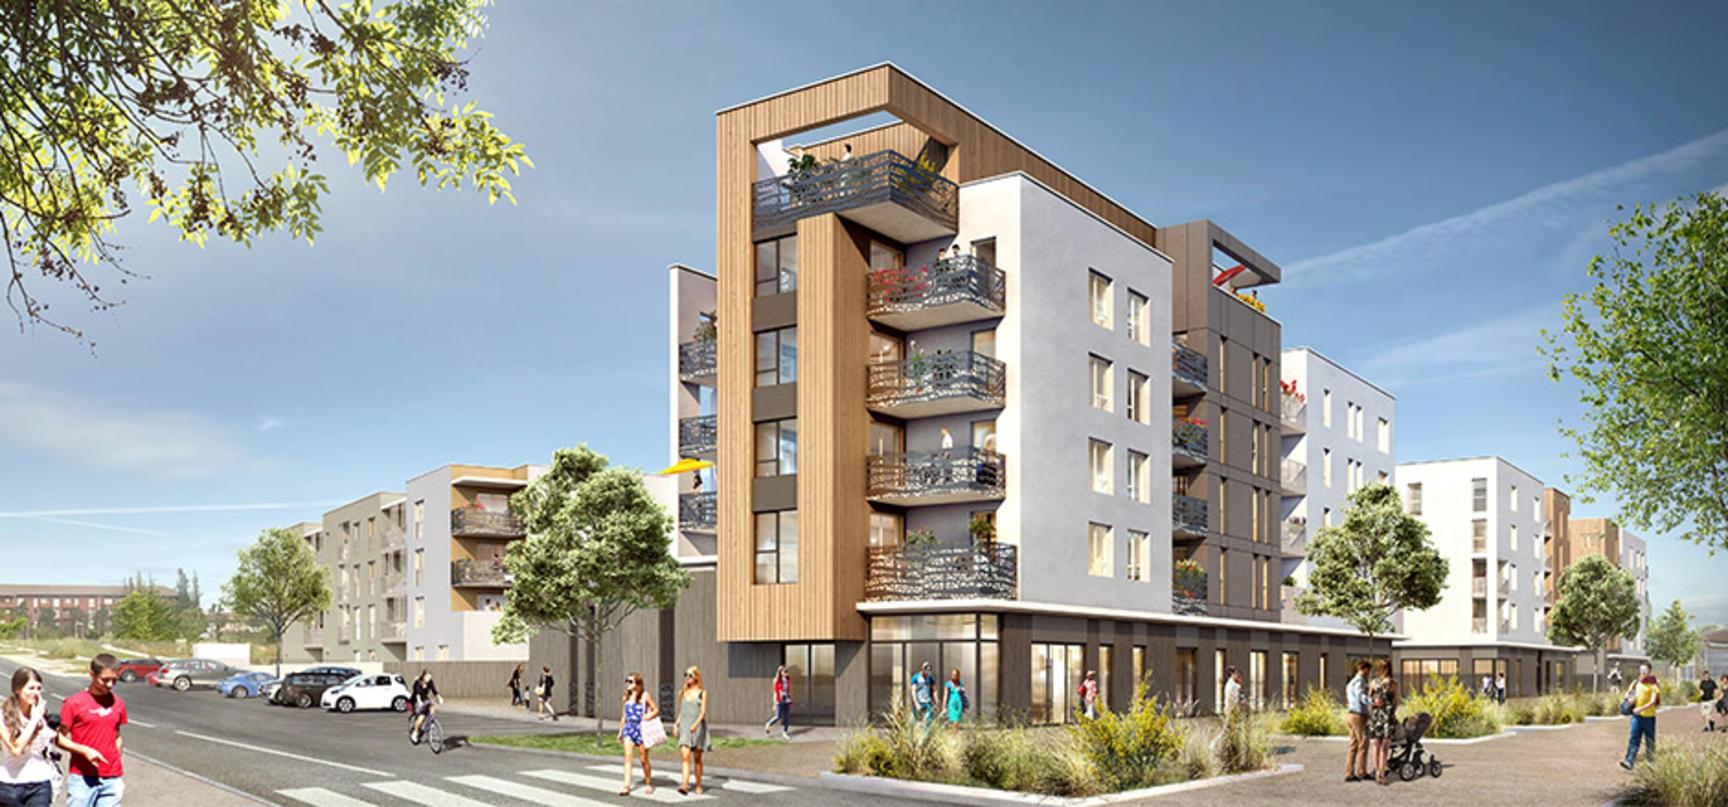 Annonce vente appartement 61 m 171 500 992738915485 for Annonce vente appartement